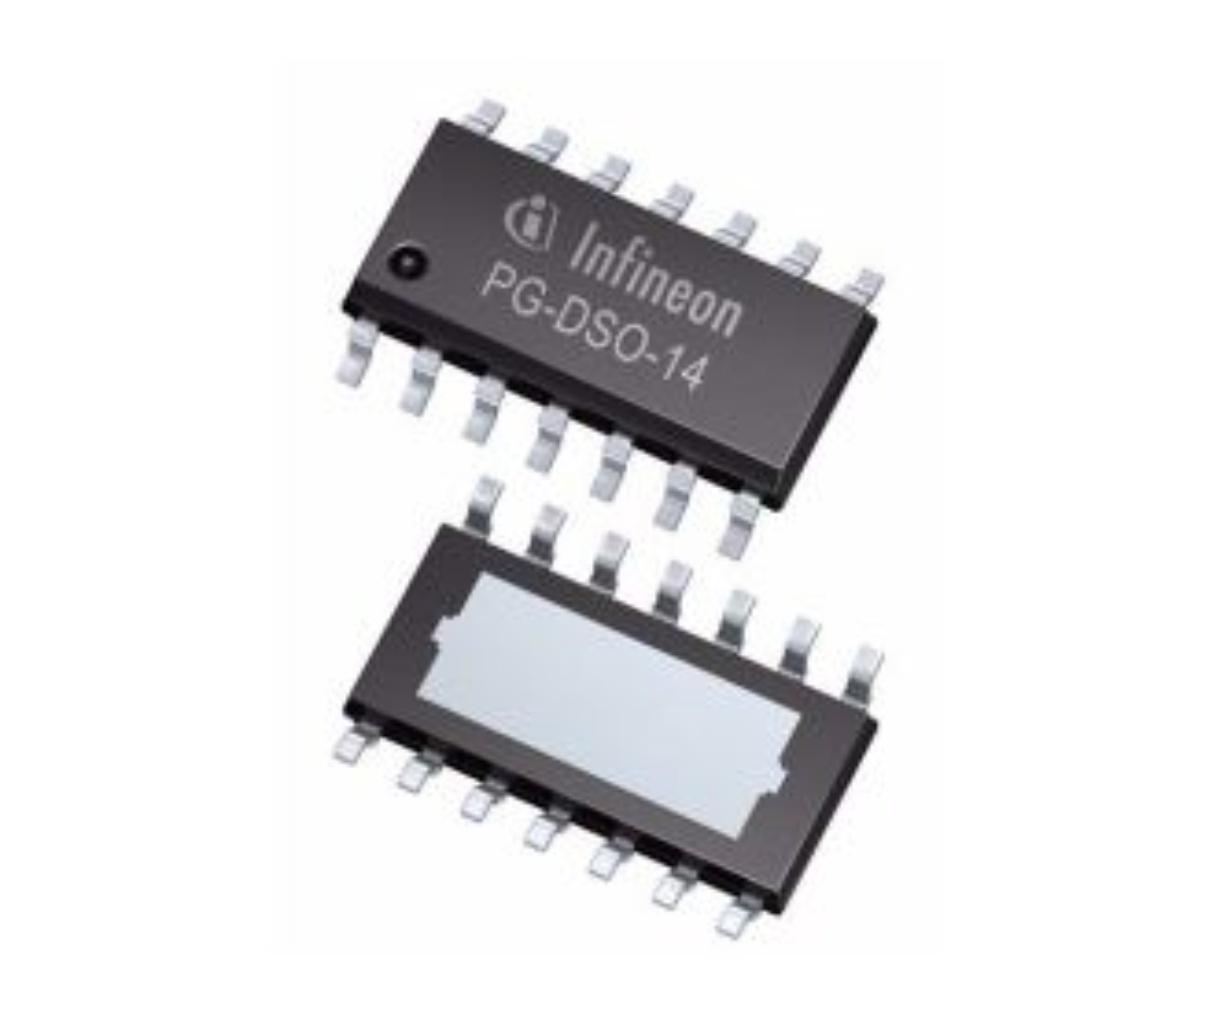 Btt6020 1eka Infineon Technologies Energy Saver Circuit Diagrams On Wiring Diagram Plc Omron Control 01 Pdf 21 Mb